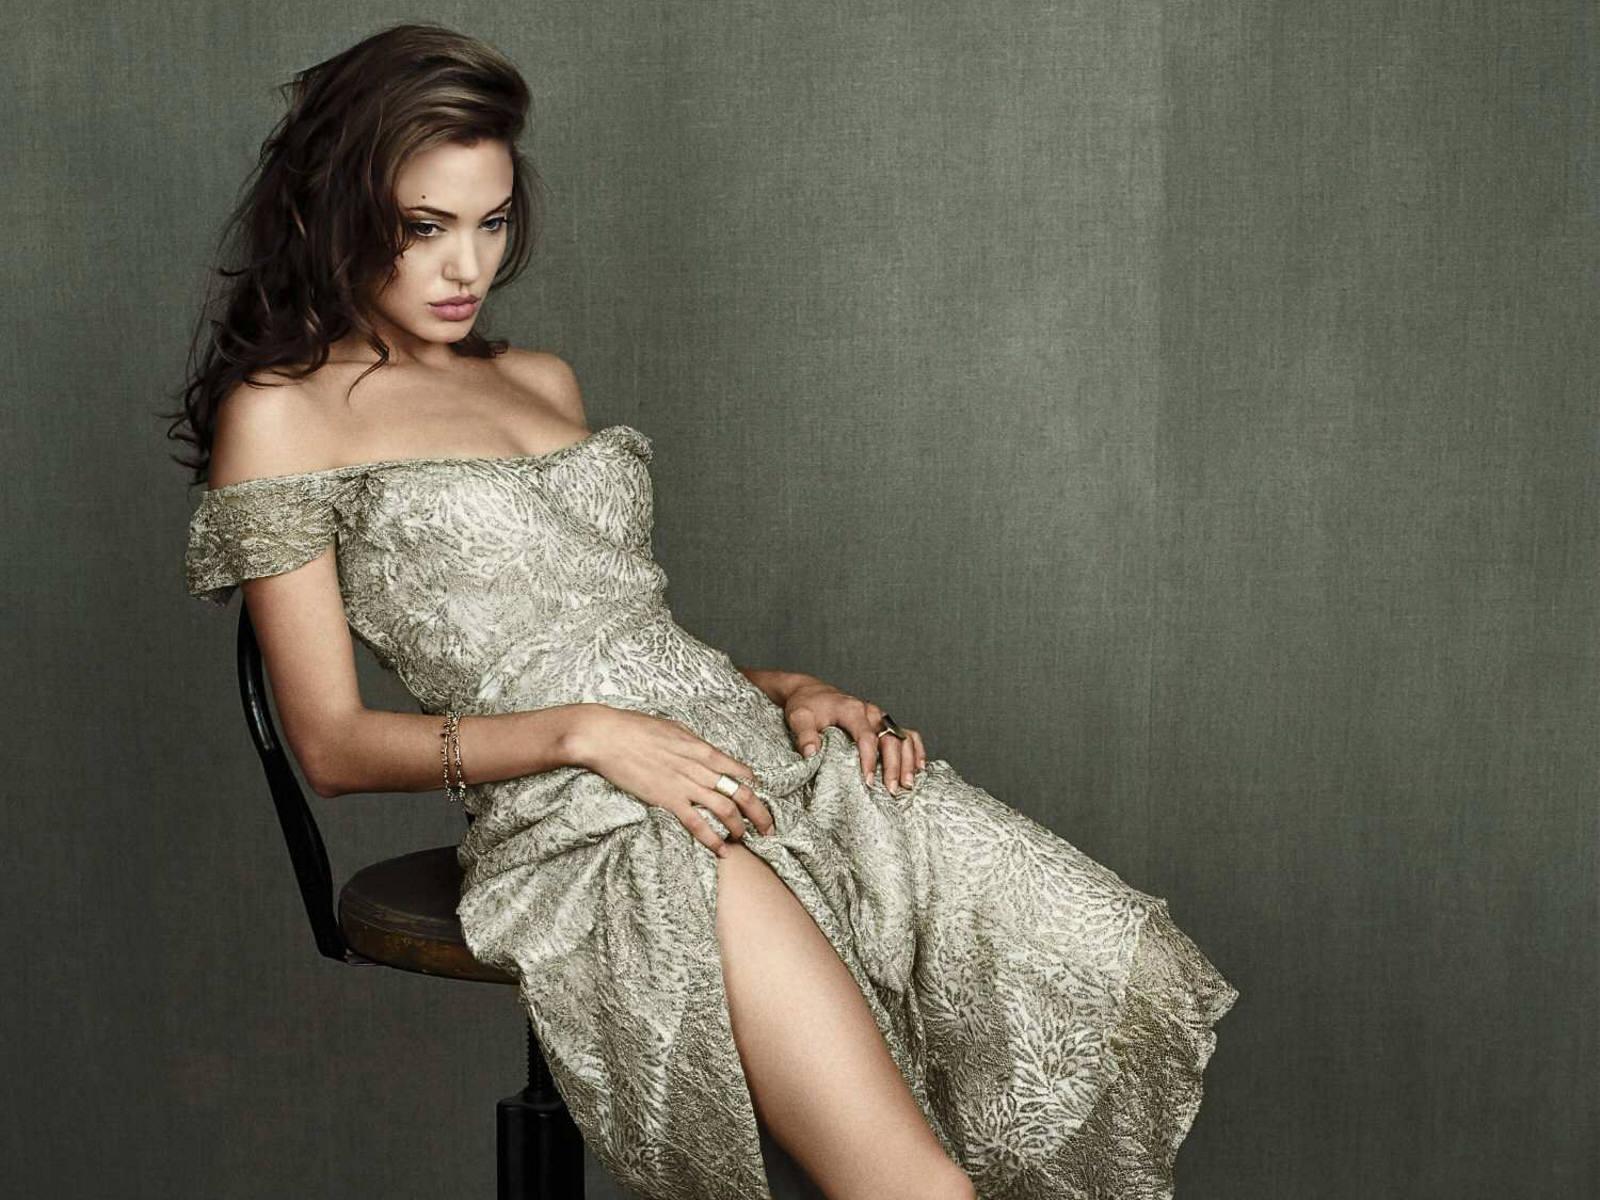 http://3.bp.blogspot.com/_p2EstT5Z5BU/THtqPbc8lkI/AAAAAAAAAsg/X5RpIoe2XP8/s1600/Angelina+Jolie+Wallpapers+4.jpg